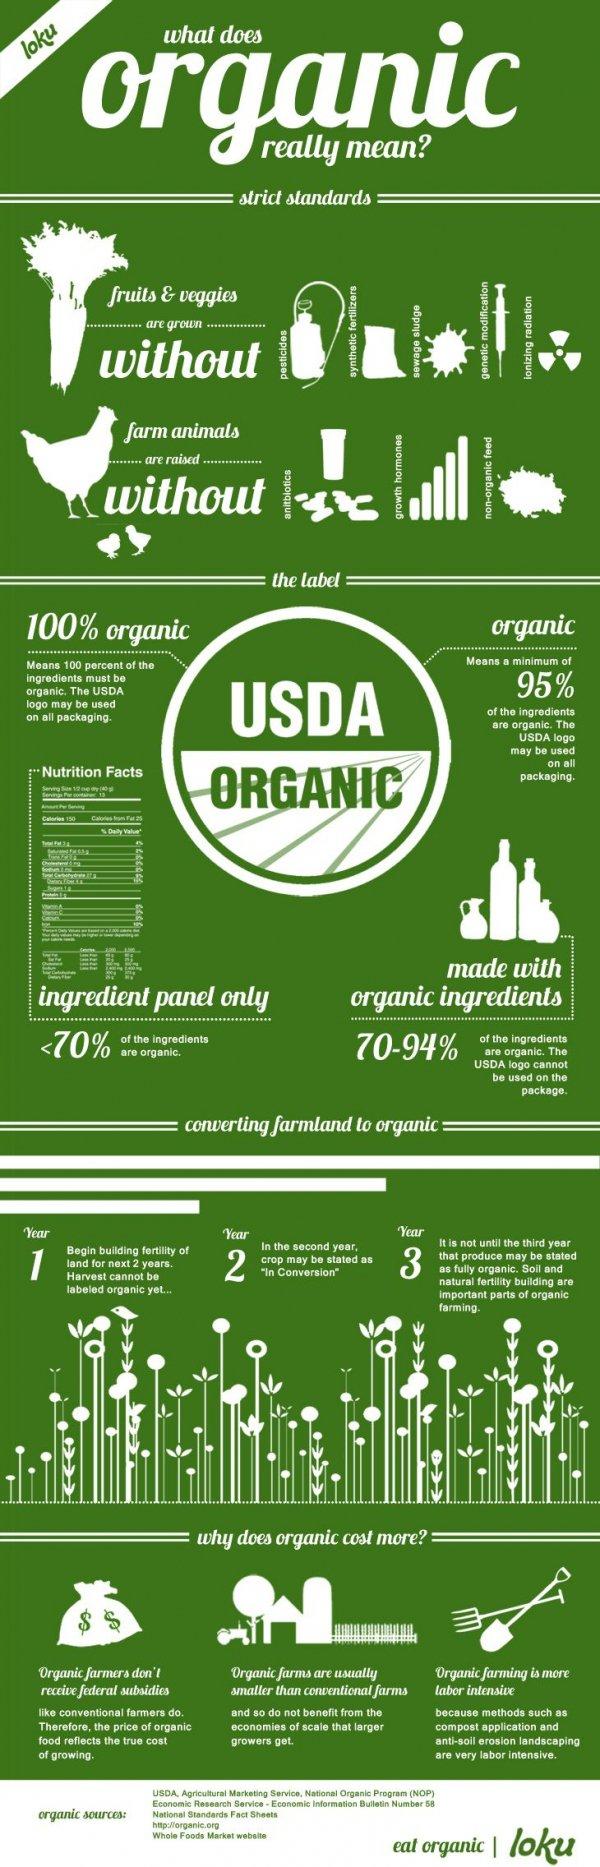 Comercializadora,Organic certification,advertising,font,product,